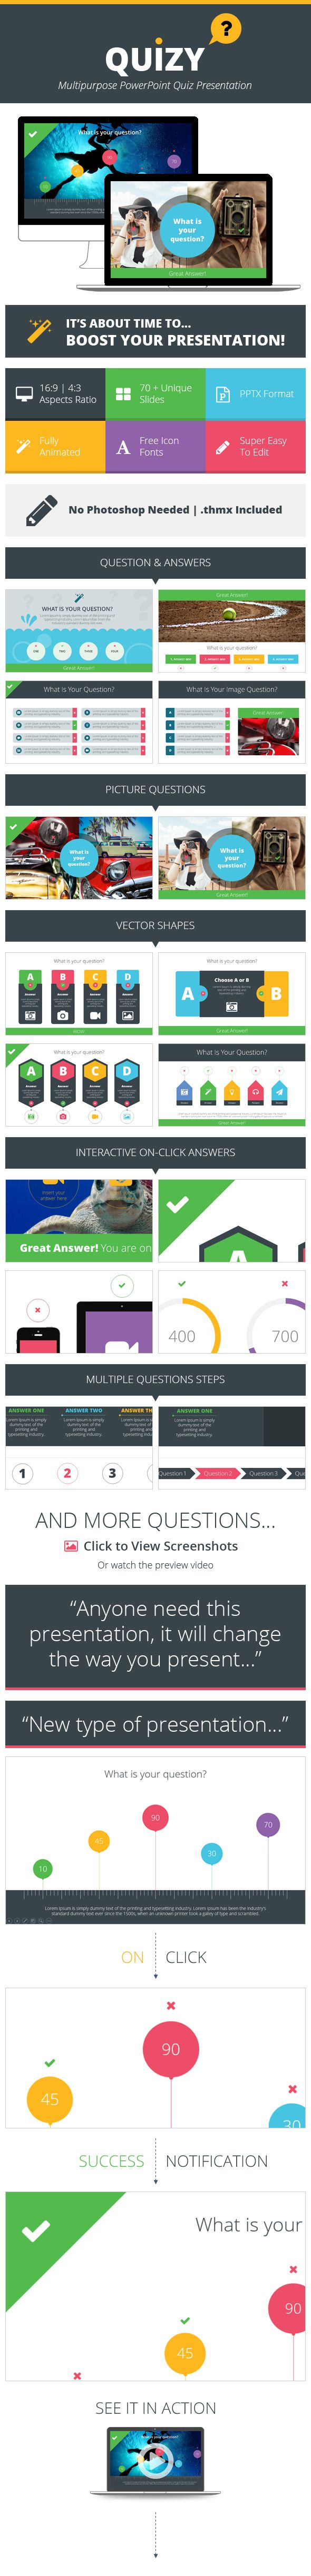 quizy multipurpose powerpoint quiz presentation powerpoint